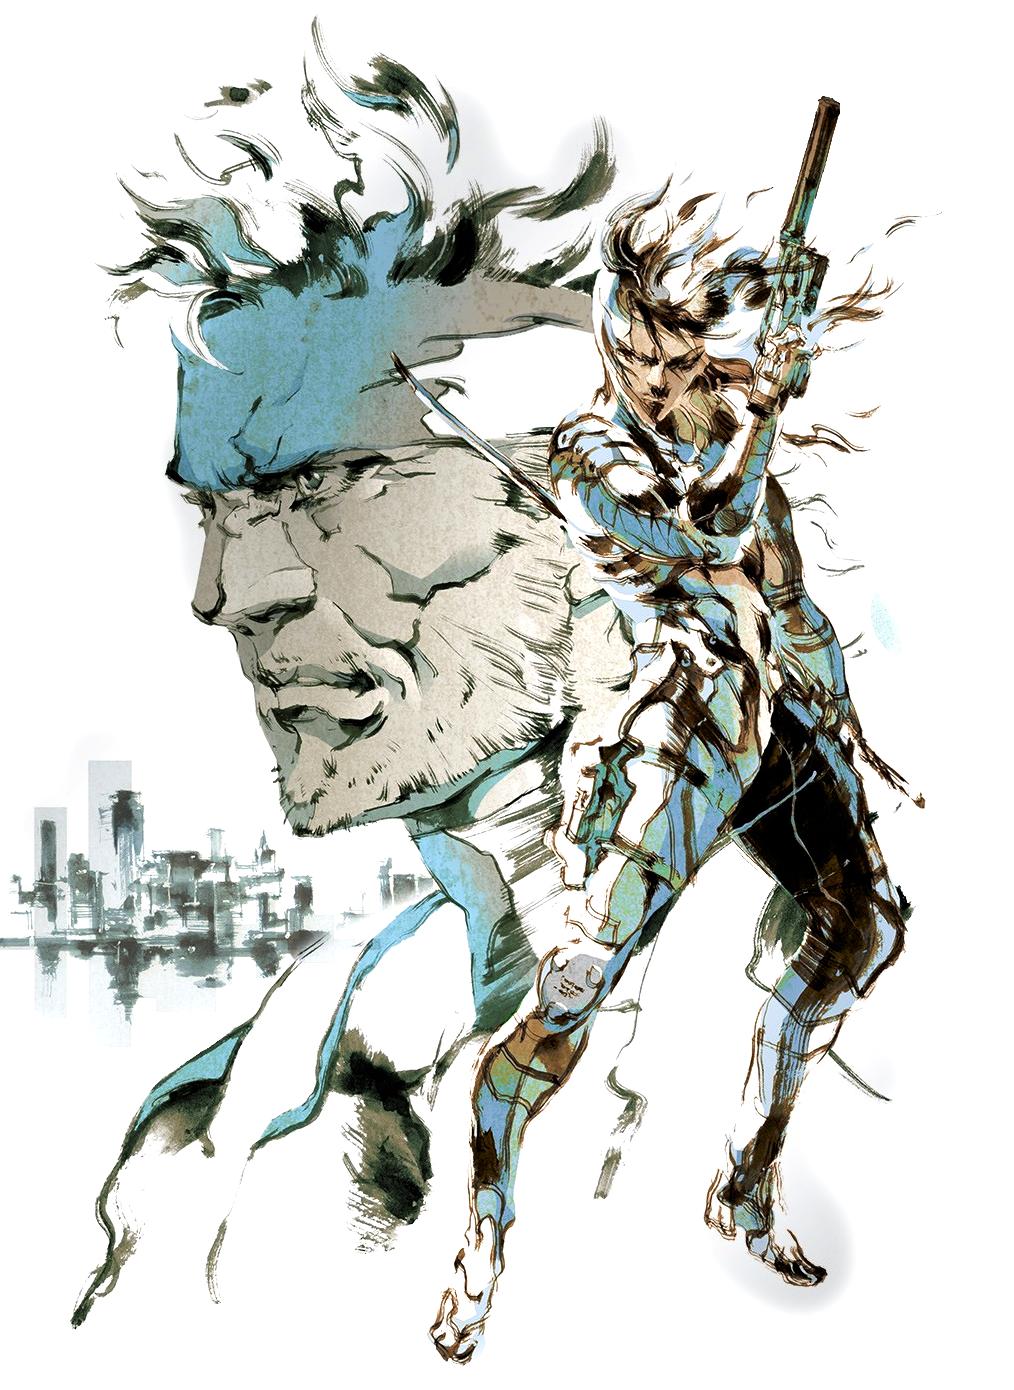 Art Of Metal Gear Solid By Yoji Shinkawa Post Metal Gear Metal Gear Solid Metal Gear Series